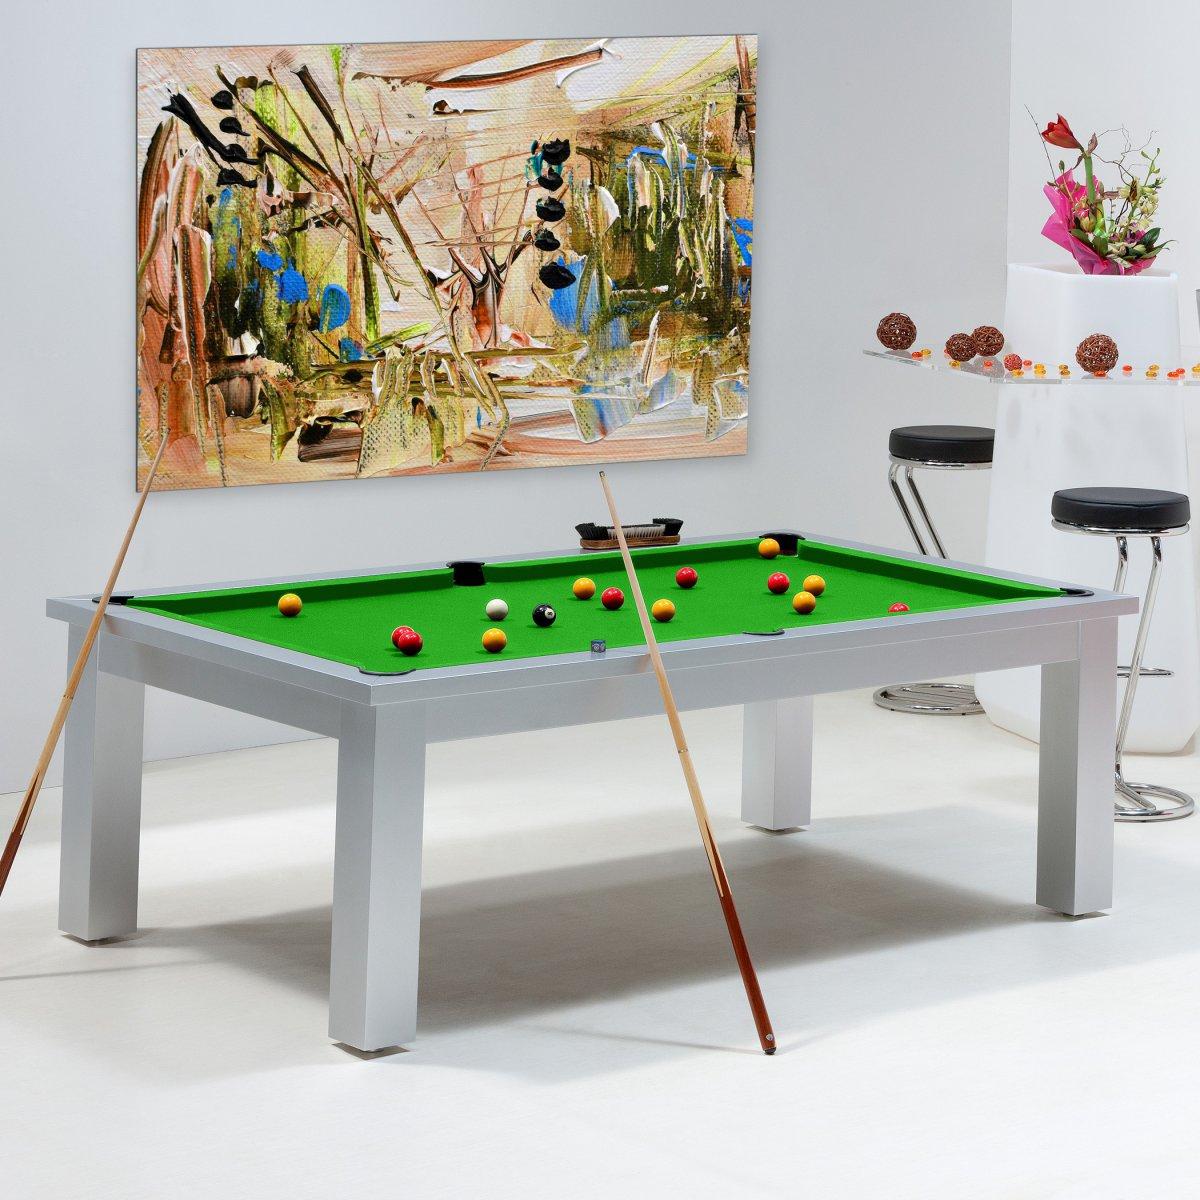 billard table billard convertible billard table memphis. Black Bedroom Furniture Sets. Home Design Ideas